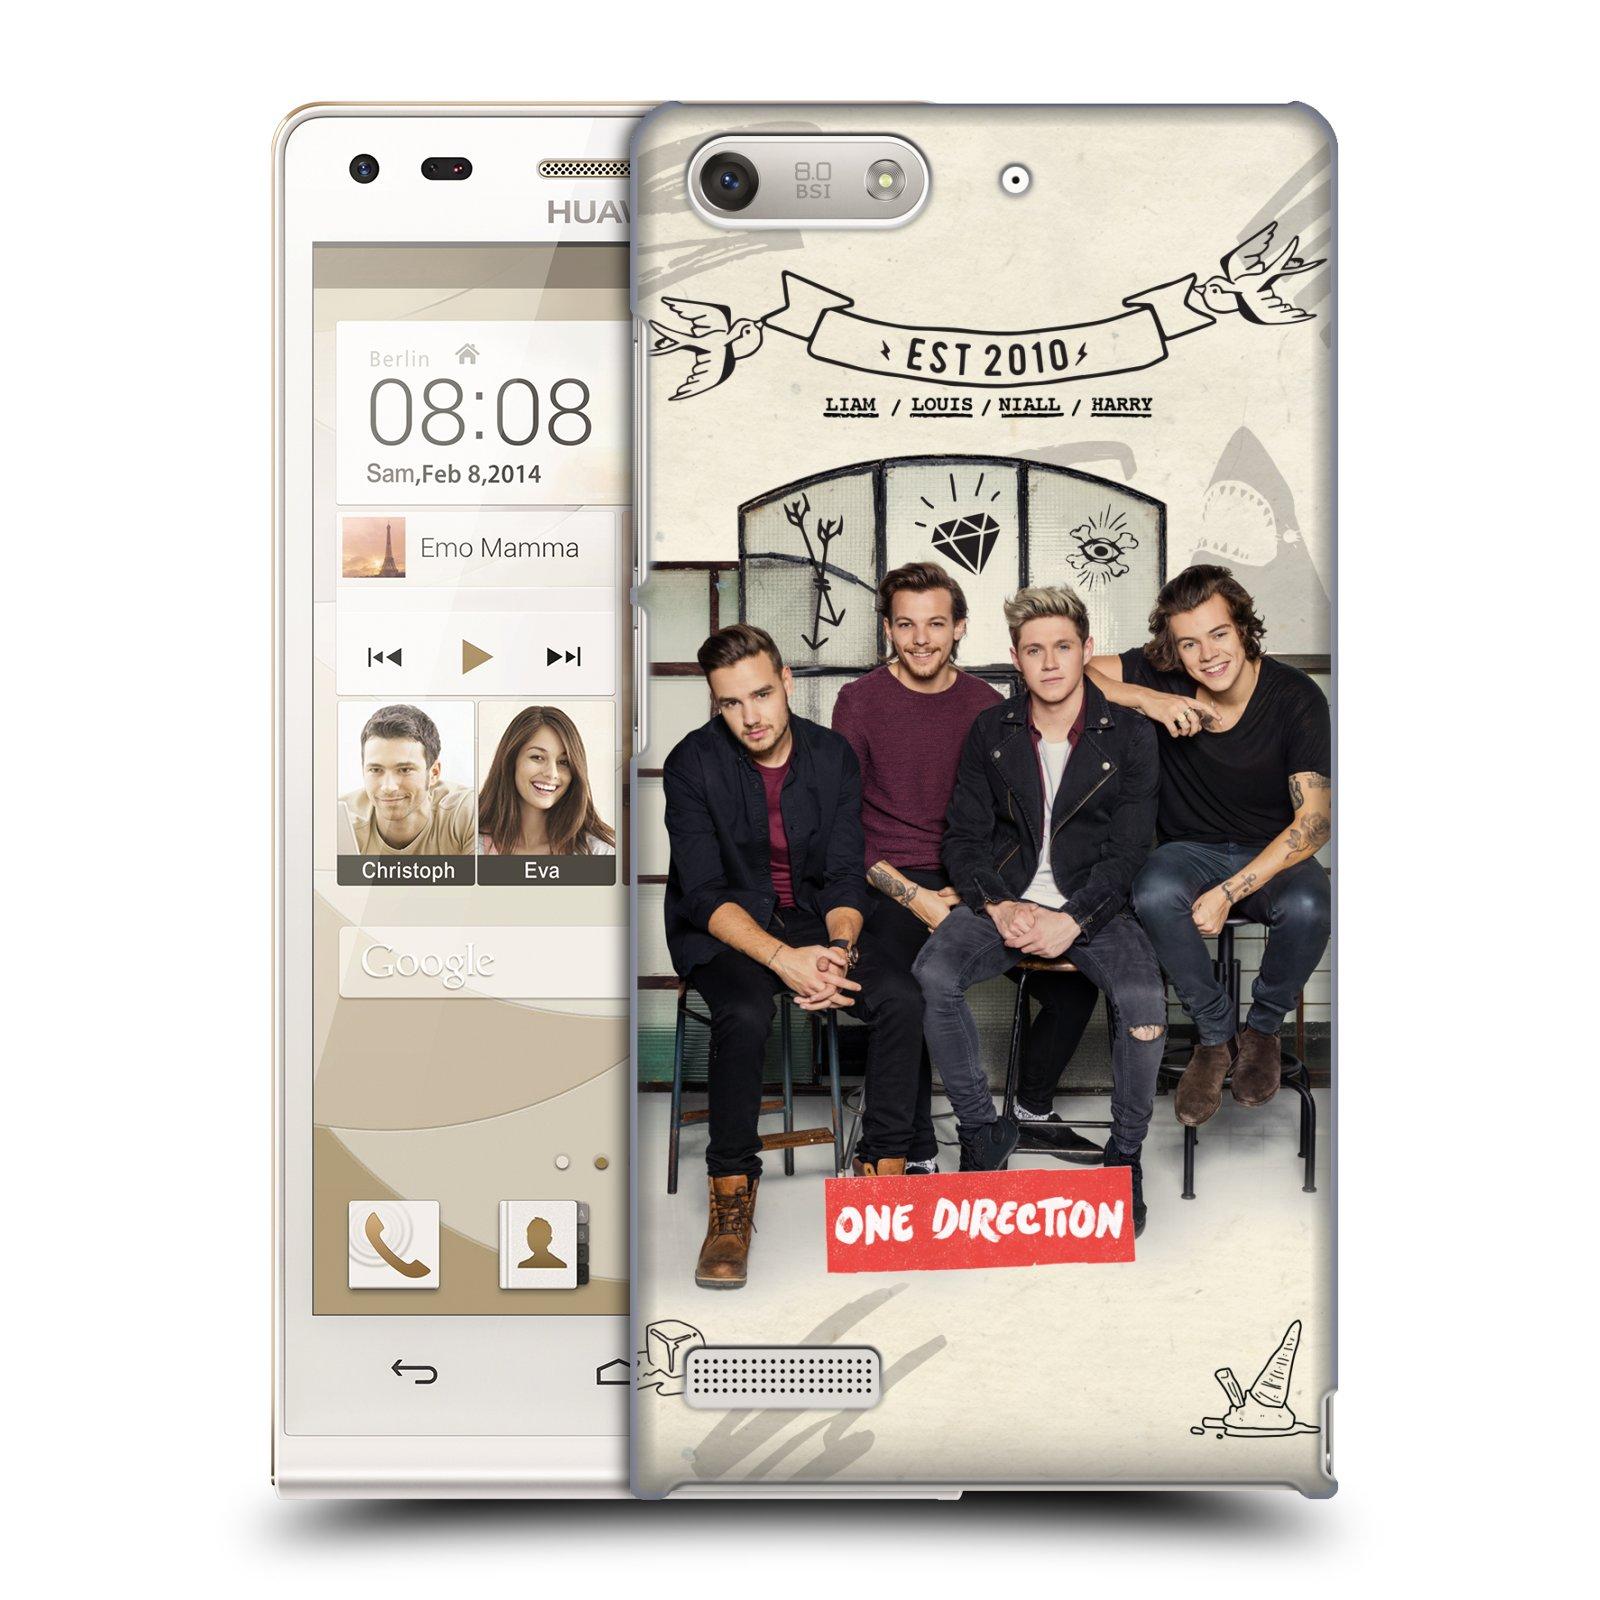 Plastové pouzdro na mobil Huawei Ascend G6 HEAD CASE One Direction - EST 2010 (Kryt či obal One Direction Official na mobilní telefon Huawei Ascend G6 bez LTE)